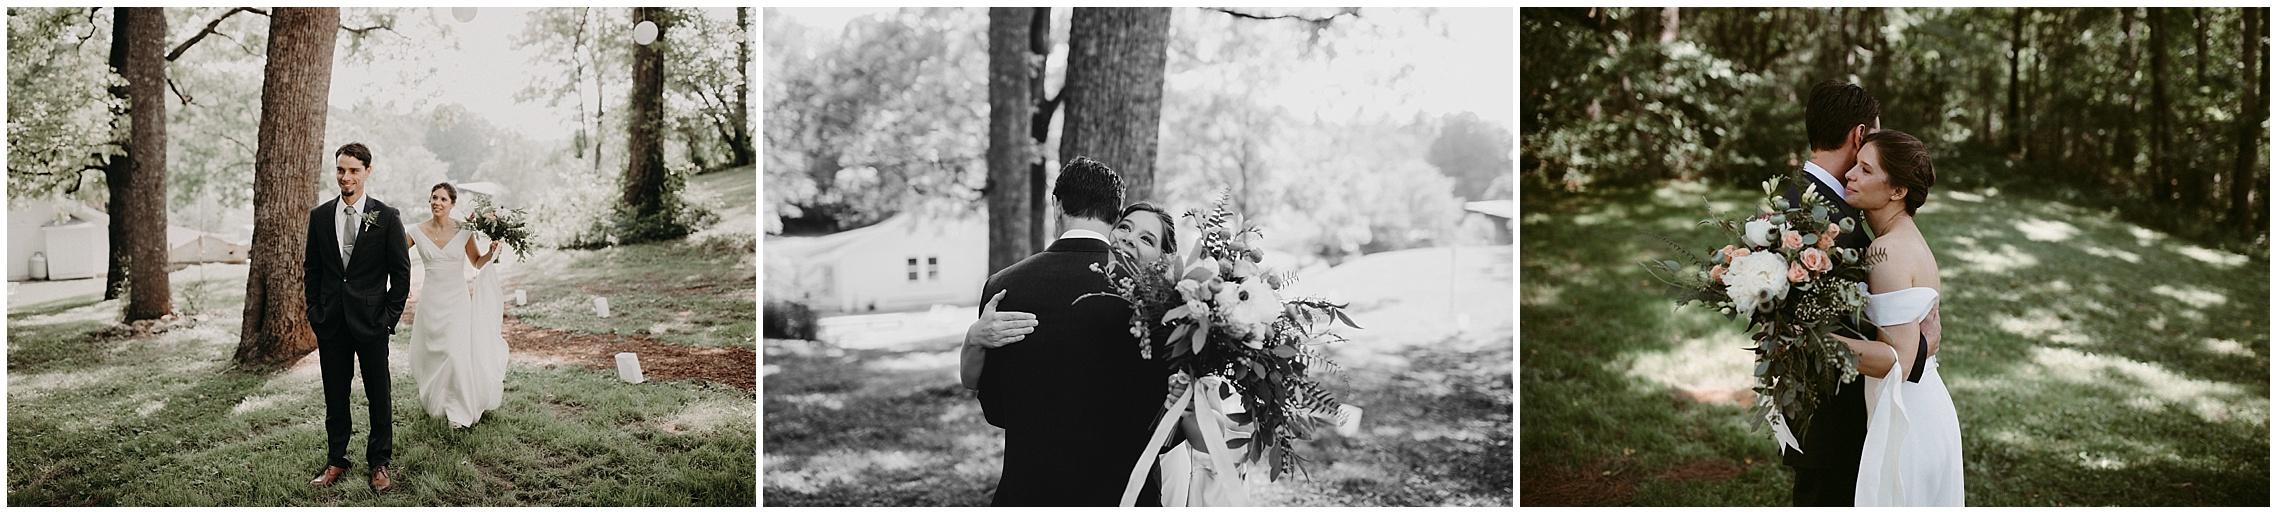 rock_creek_gardens_washington_wedding_photographer_0327.jpg